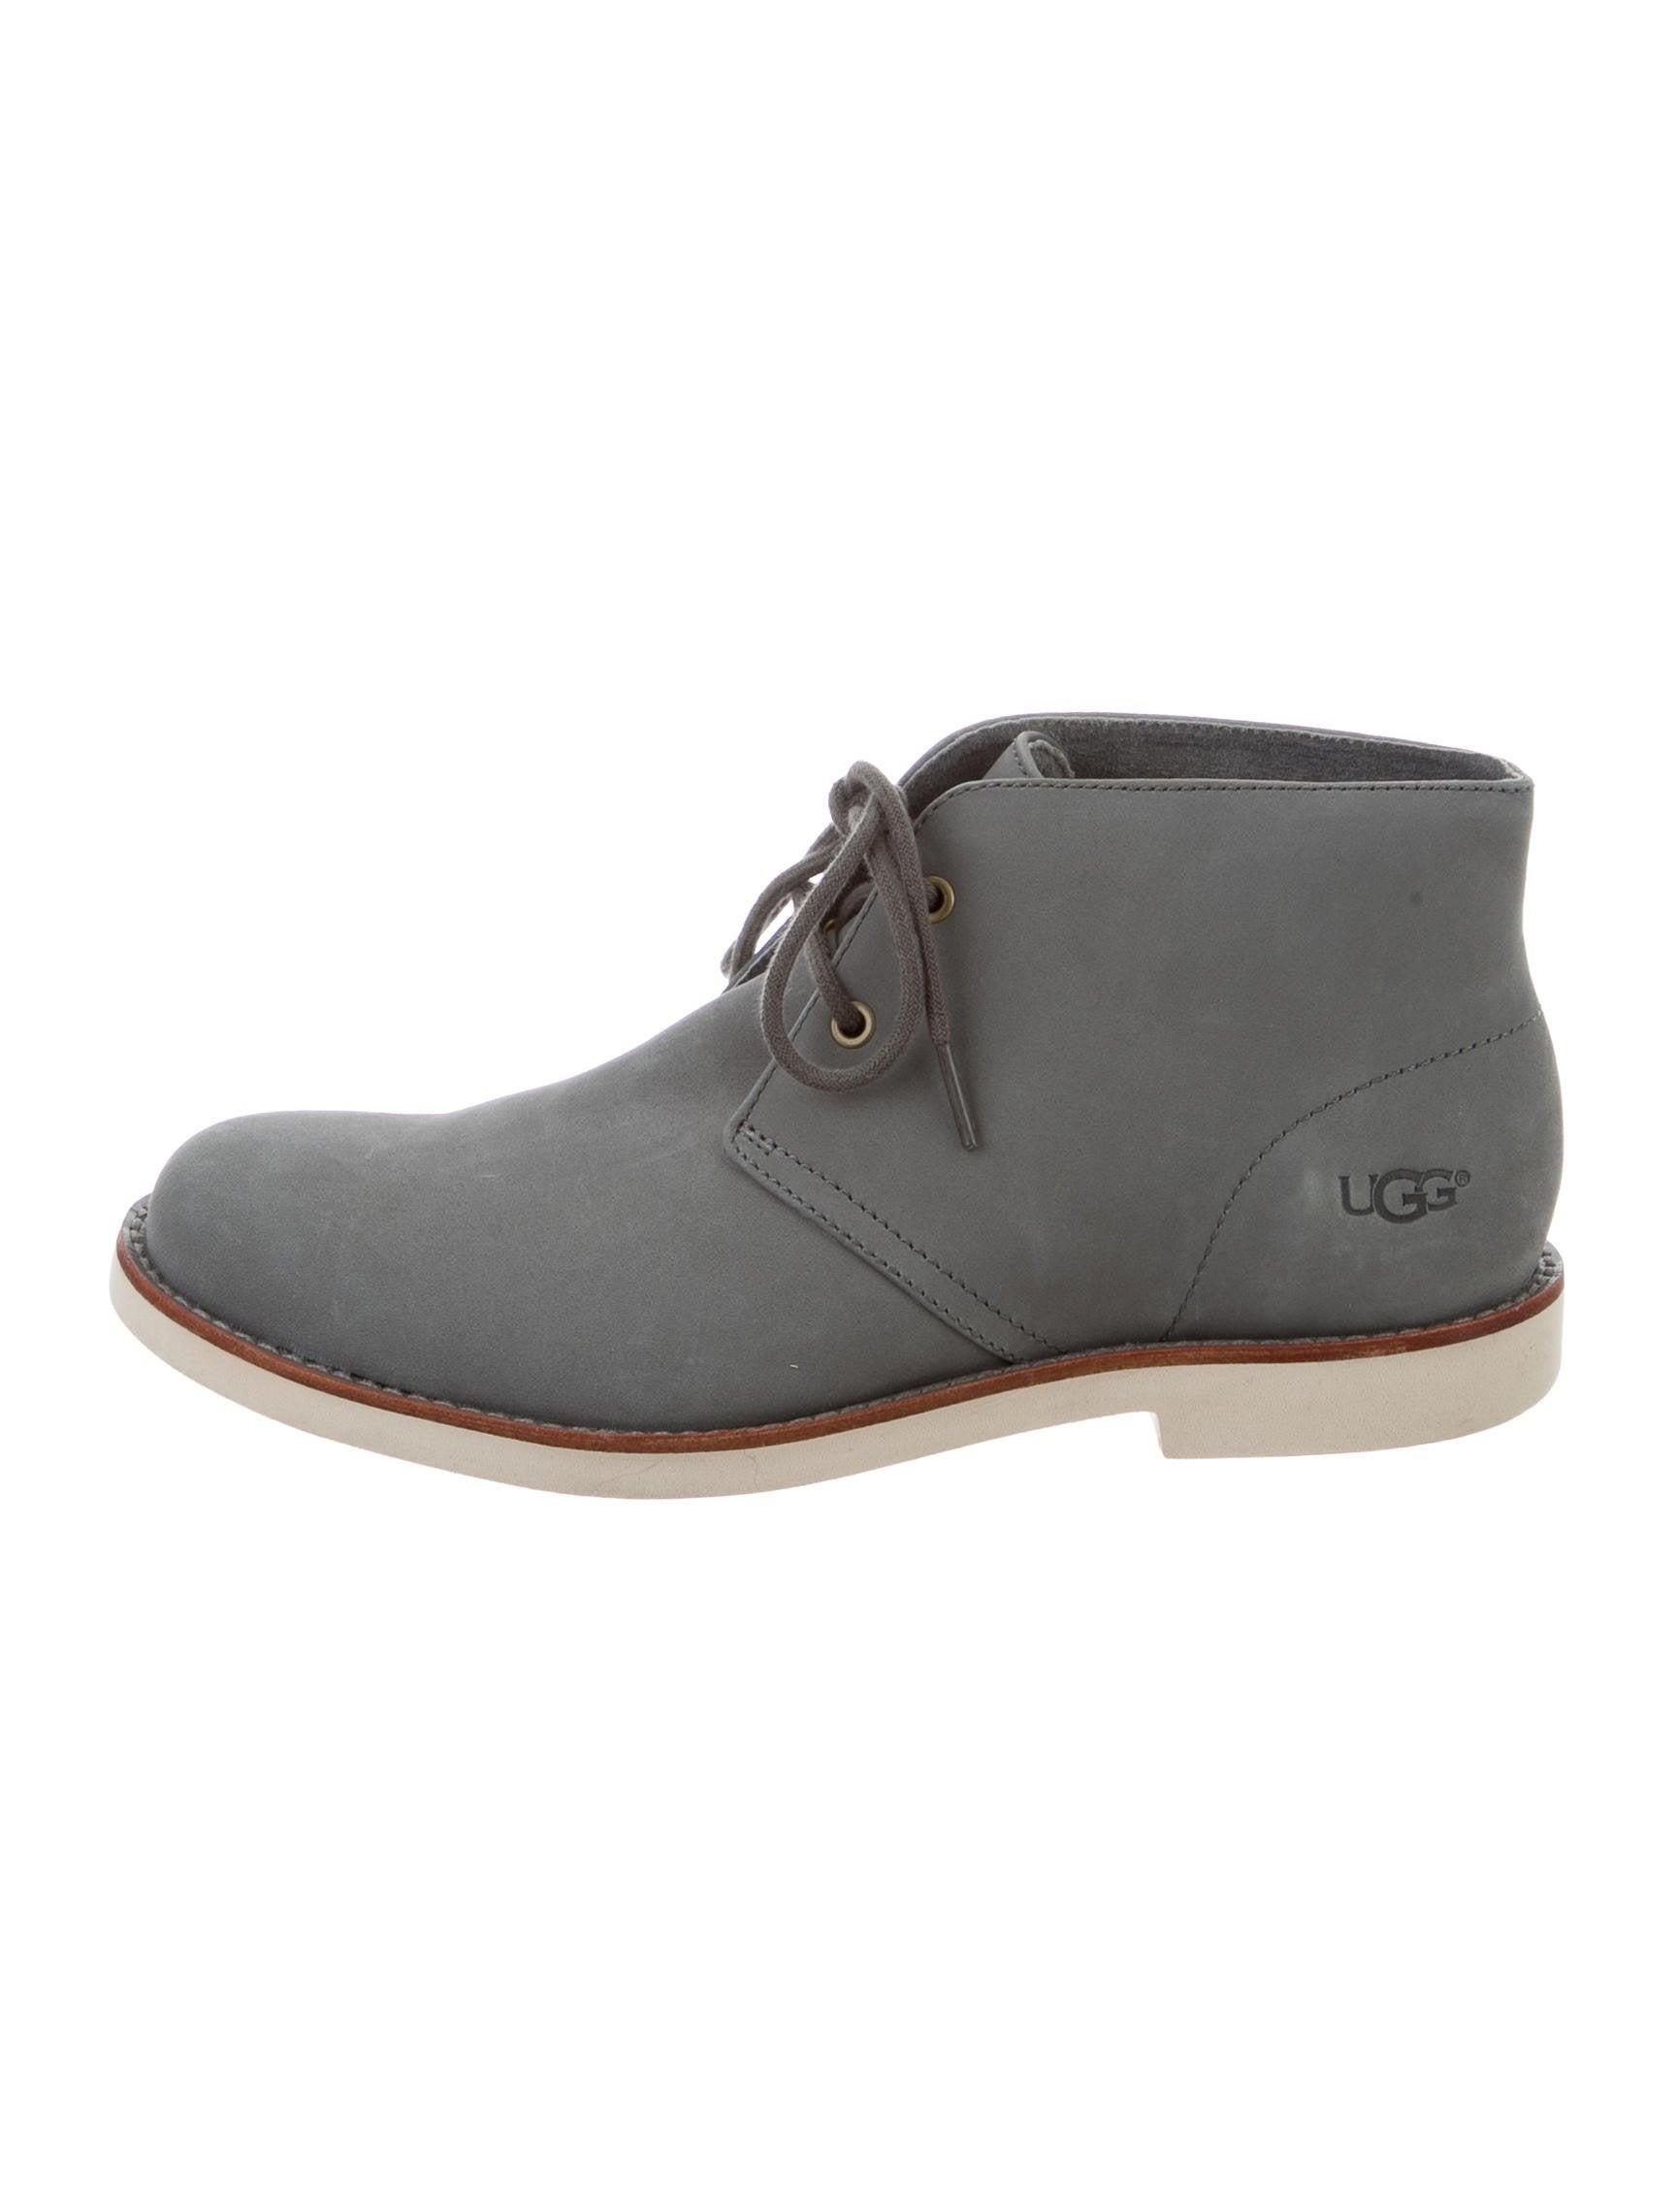 ugg australia westly chukka boot